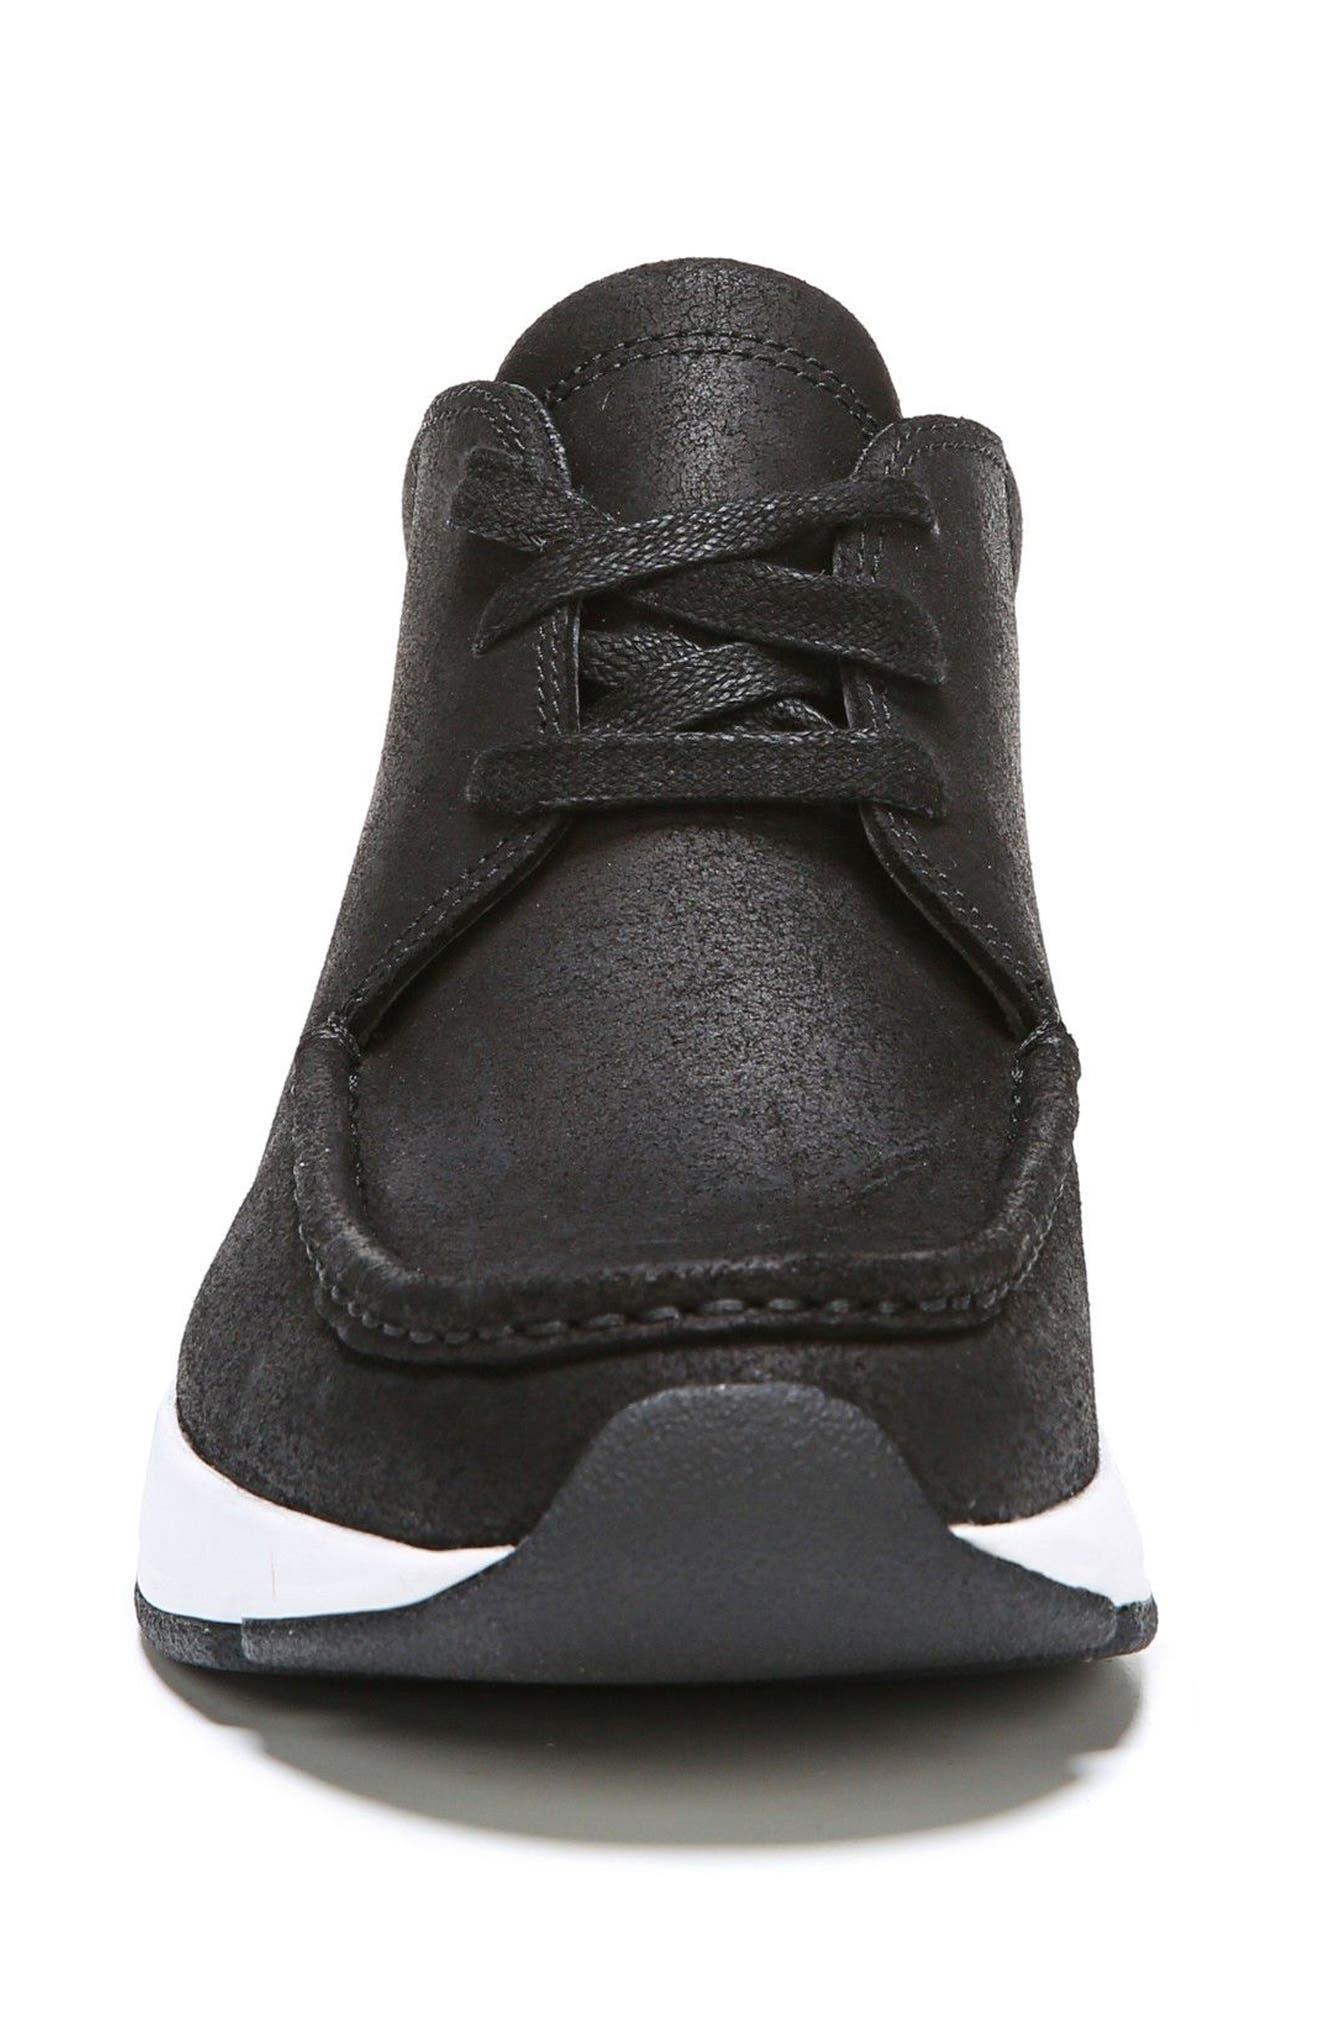 Toronto Chukka Sneaker,                             Alternate thumbnail 4, color,                             002